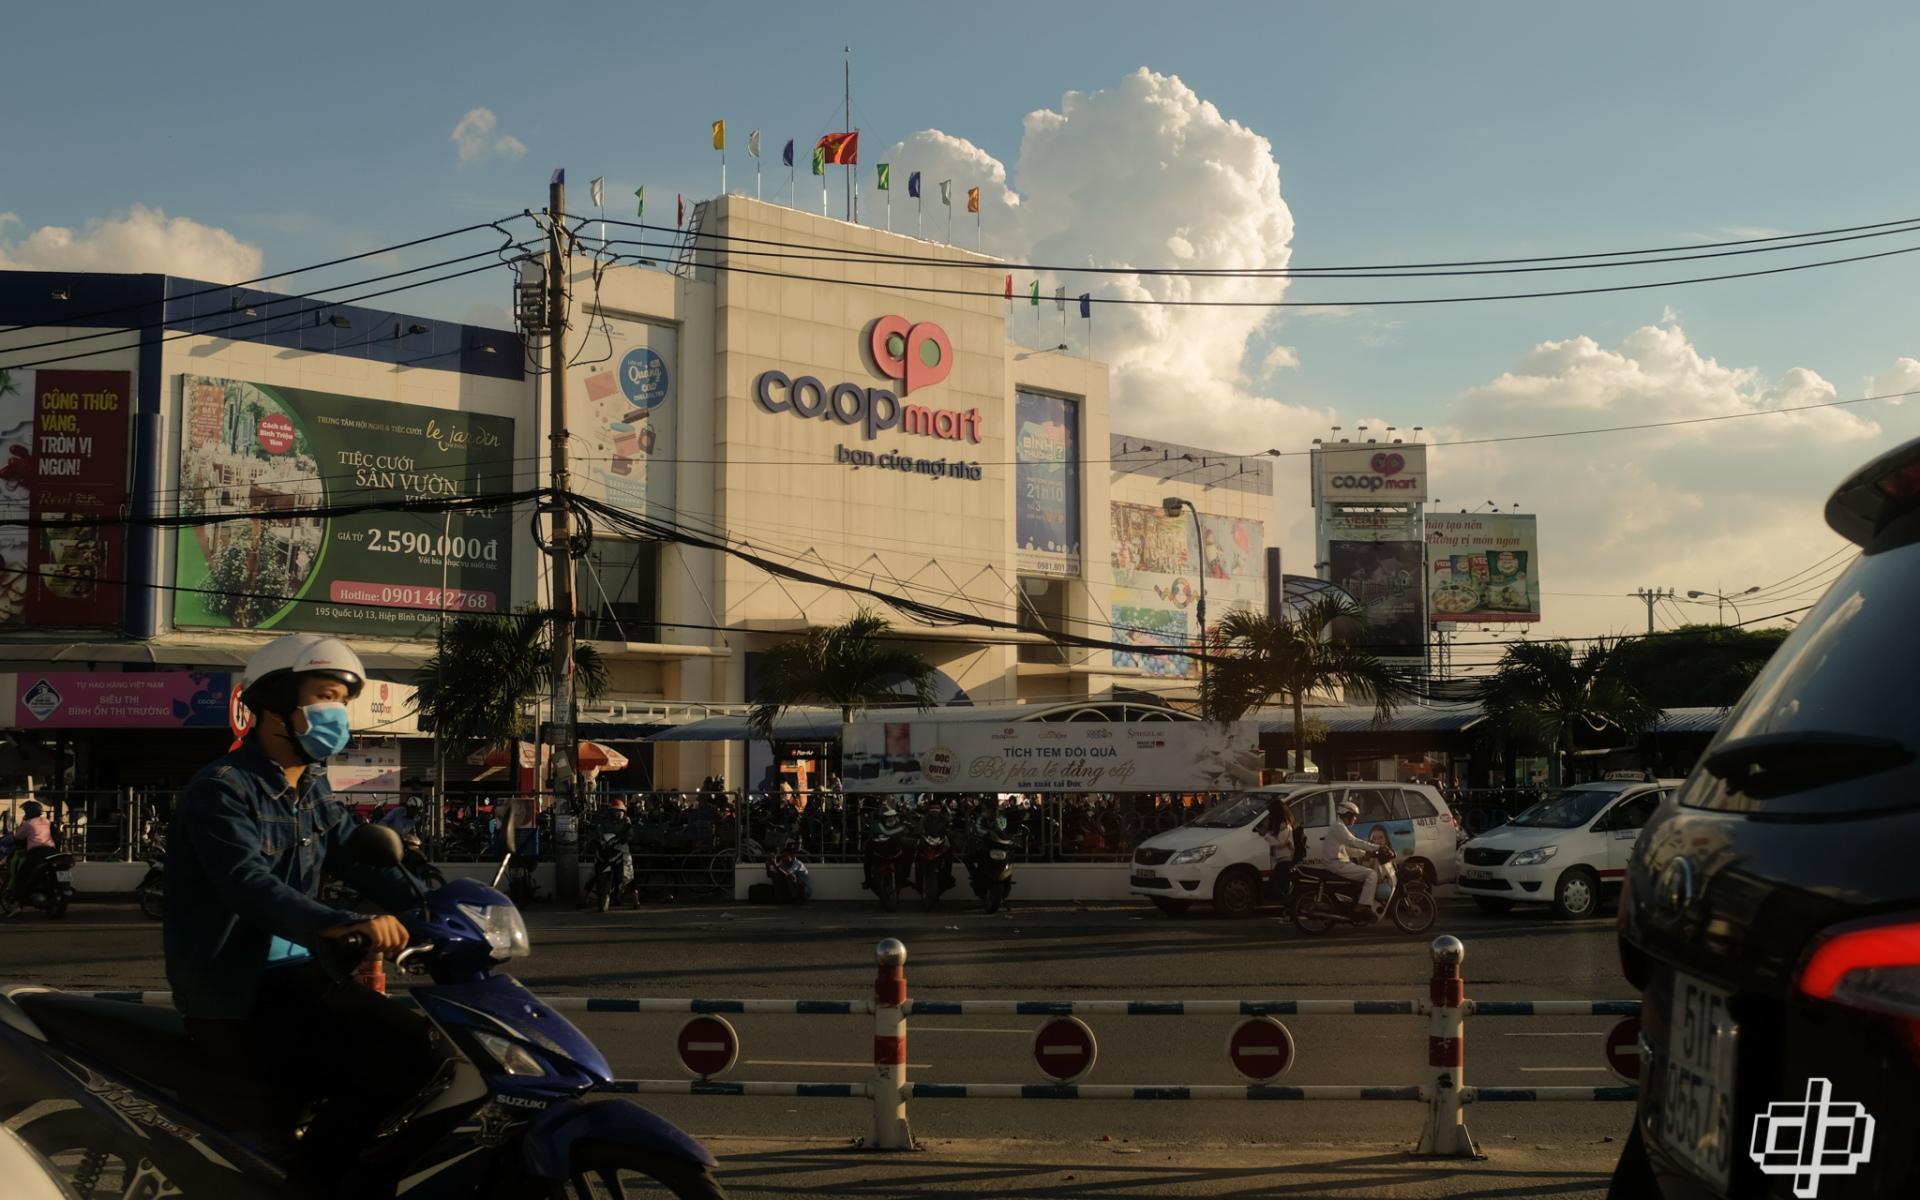 FUJIFILM X100F - Explore Ho Chi Minh City (Saigon)